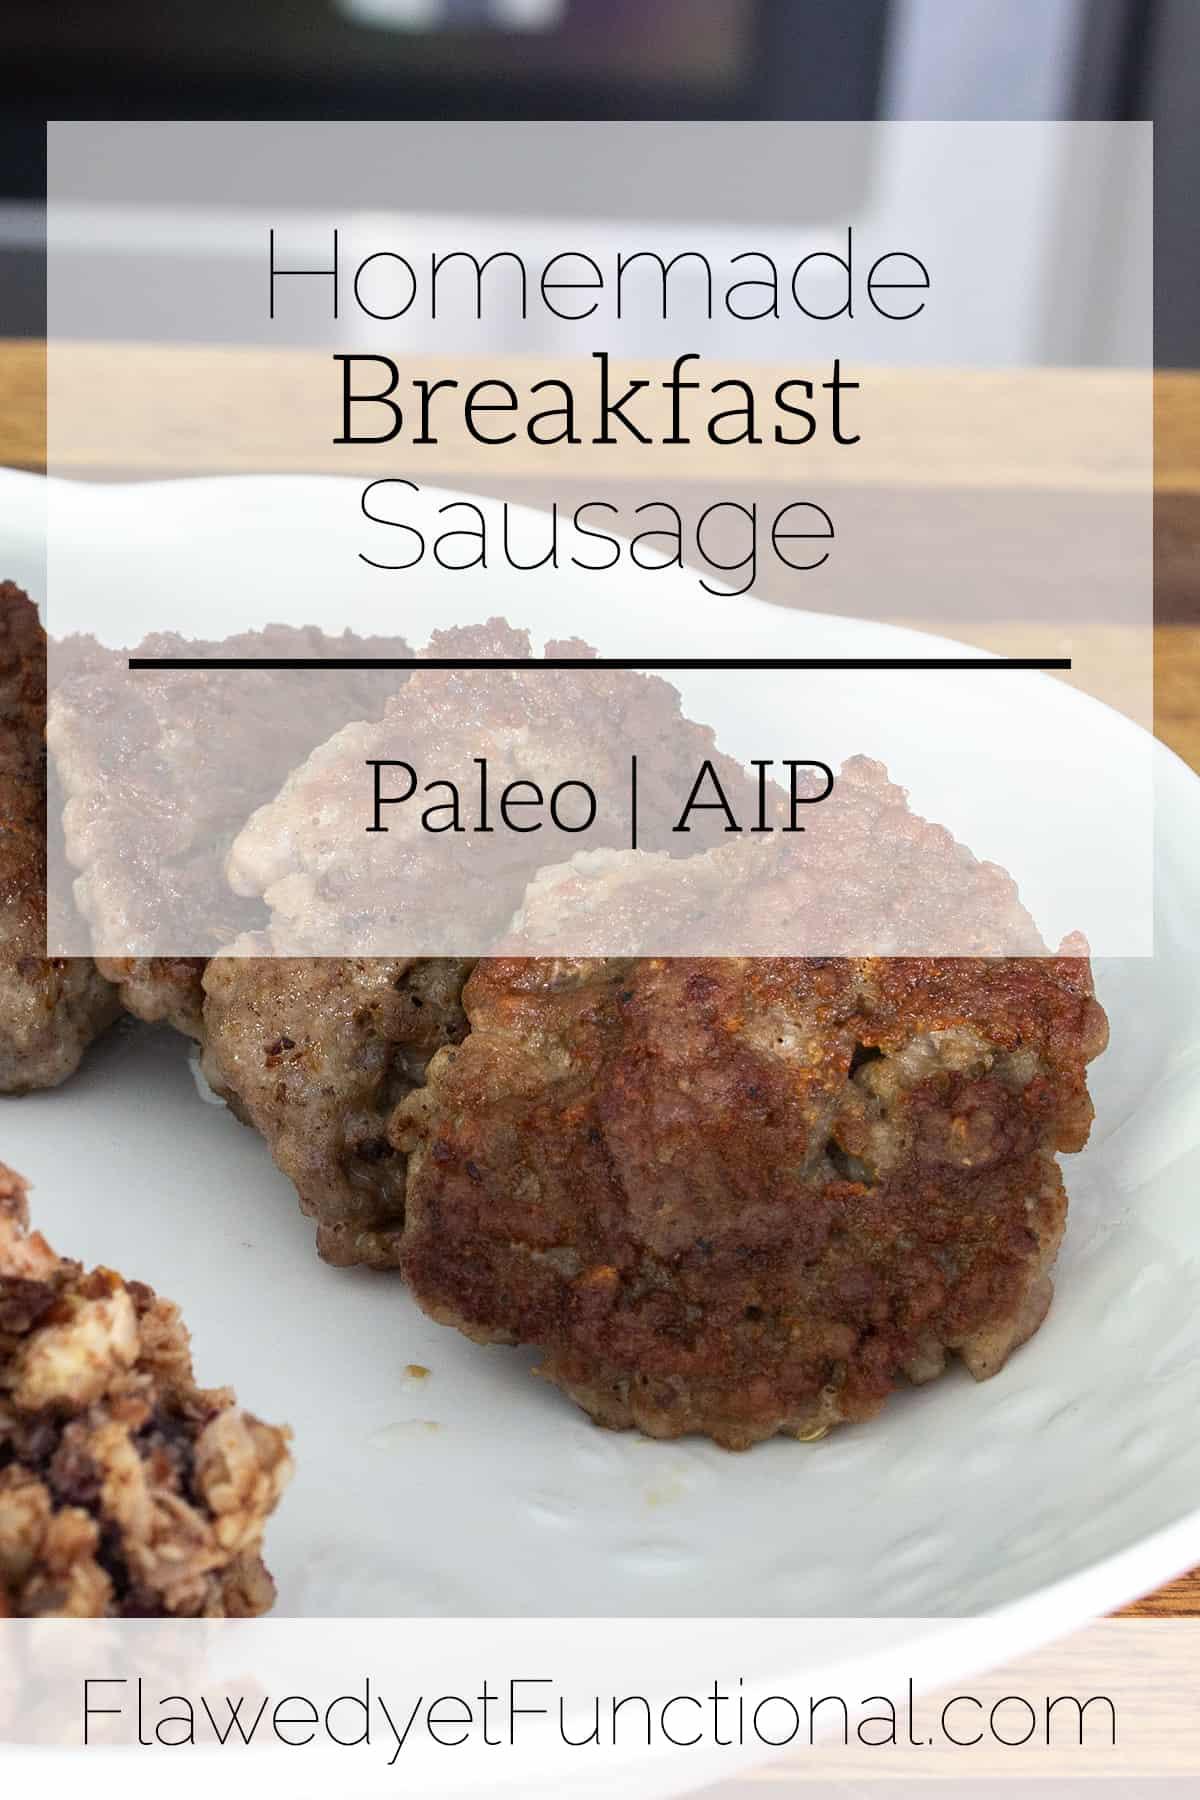 Homemade Breakfast Sausage | Paleo & AIP Recipe